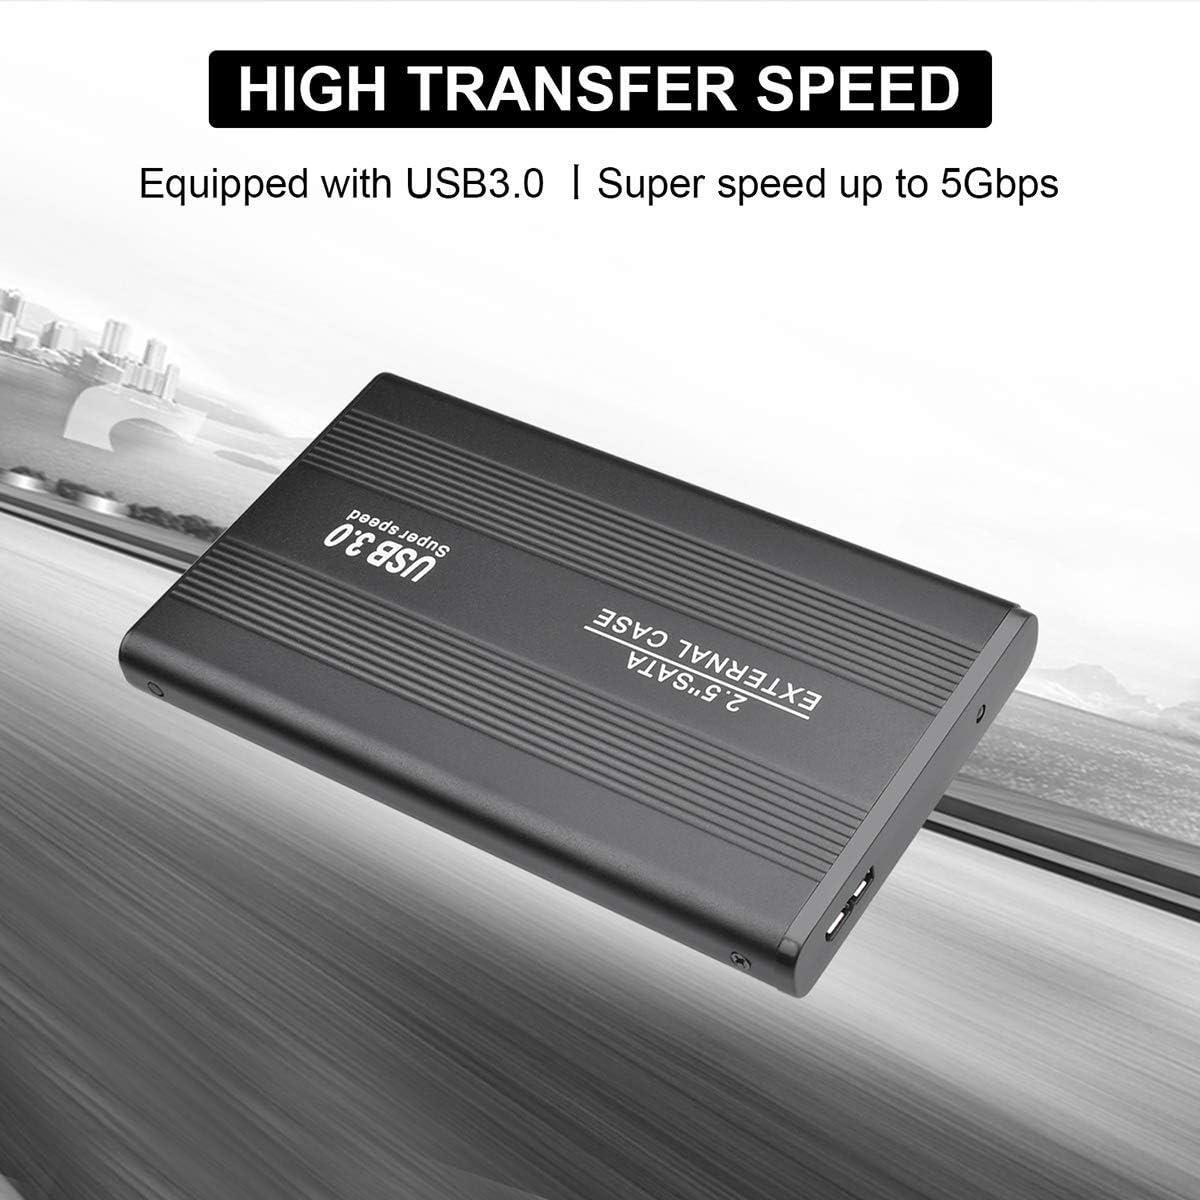 ASUME 2TB External Hard Drive USB 3.0 Hard Drive 2.5